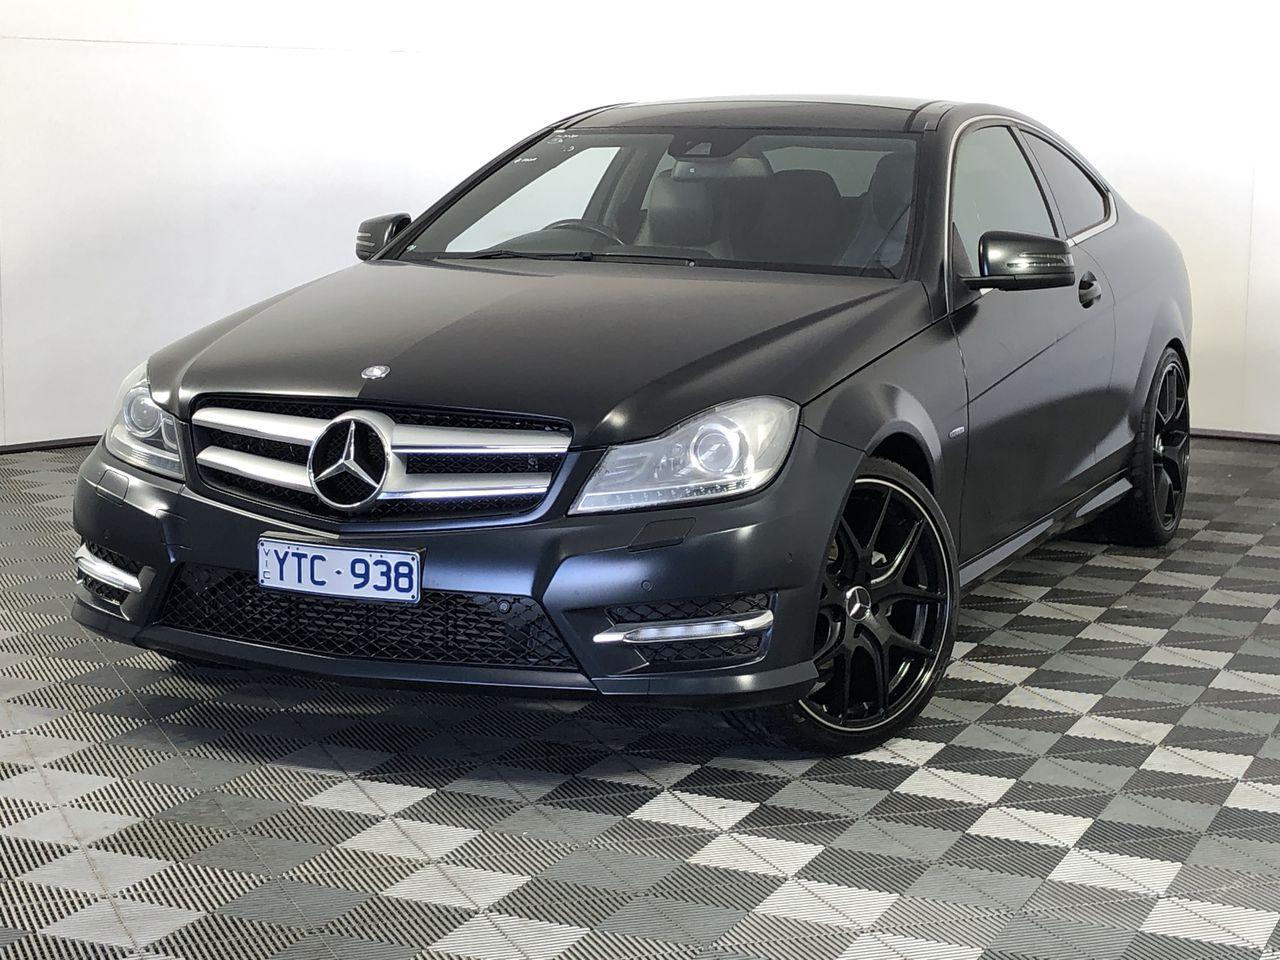 2012 Mercedes Benz C250 Automatic Coupe